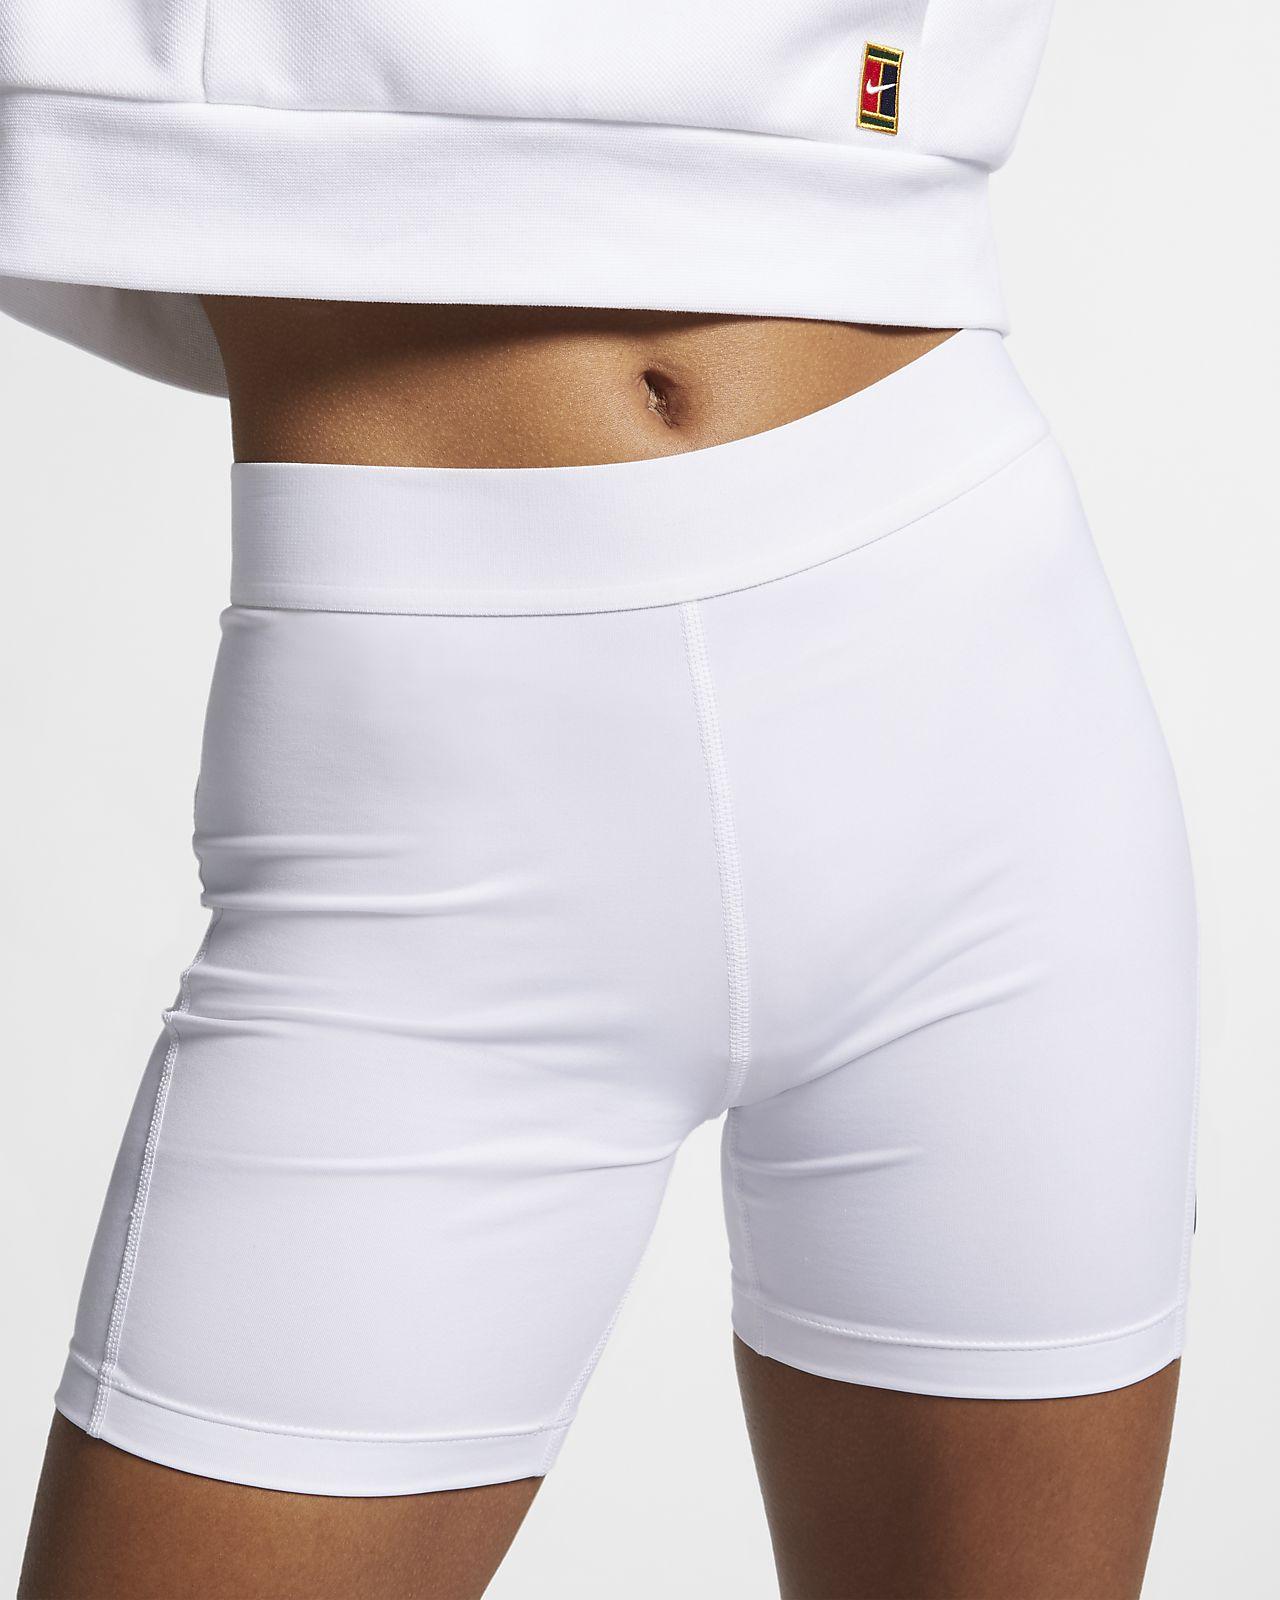 NikeCourt Power Damen-Tennisshorts (ca. 10 cm)